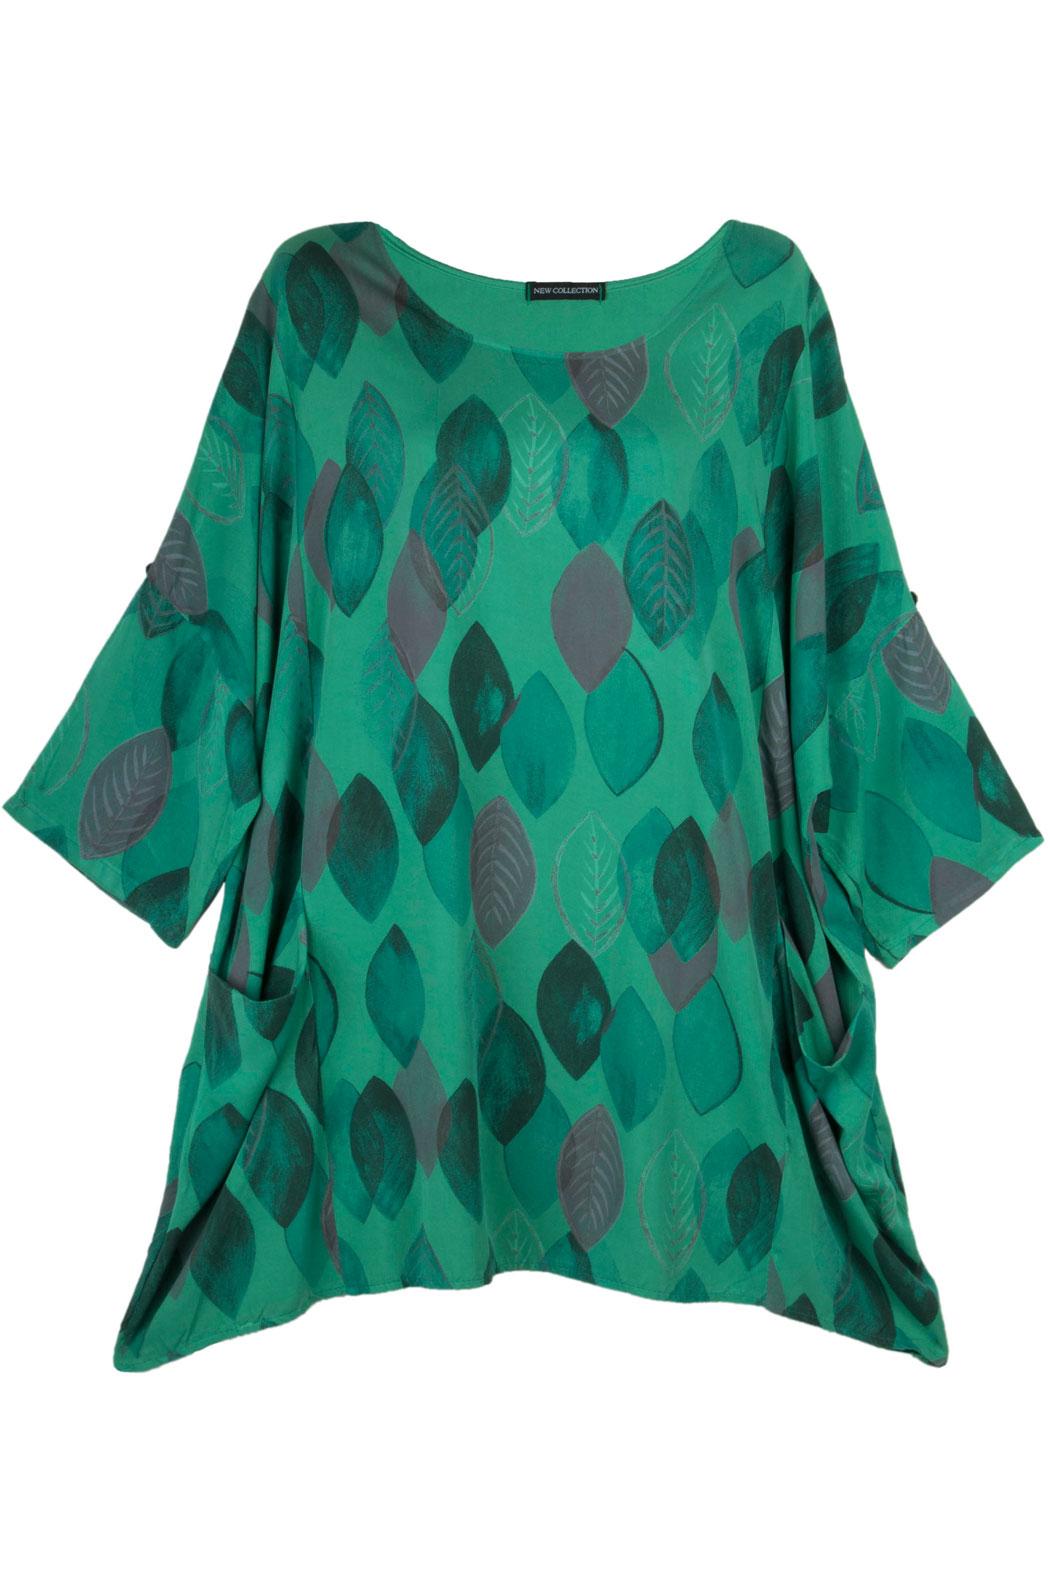 30afe73b055451 Tunika Shirt Damen Viskose Halbarm Oversize Edel Viele Farben 46 48, 29,90 €